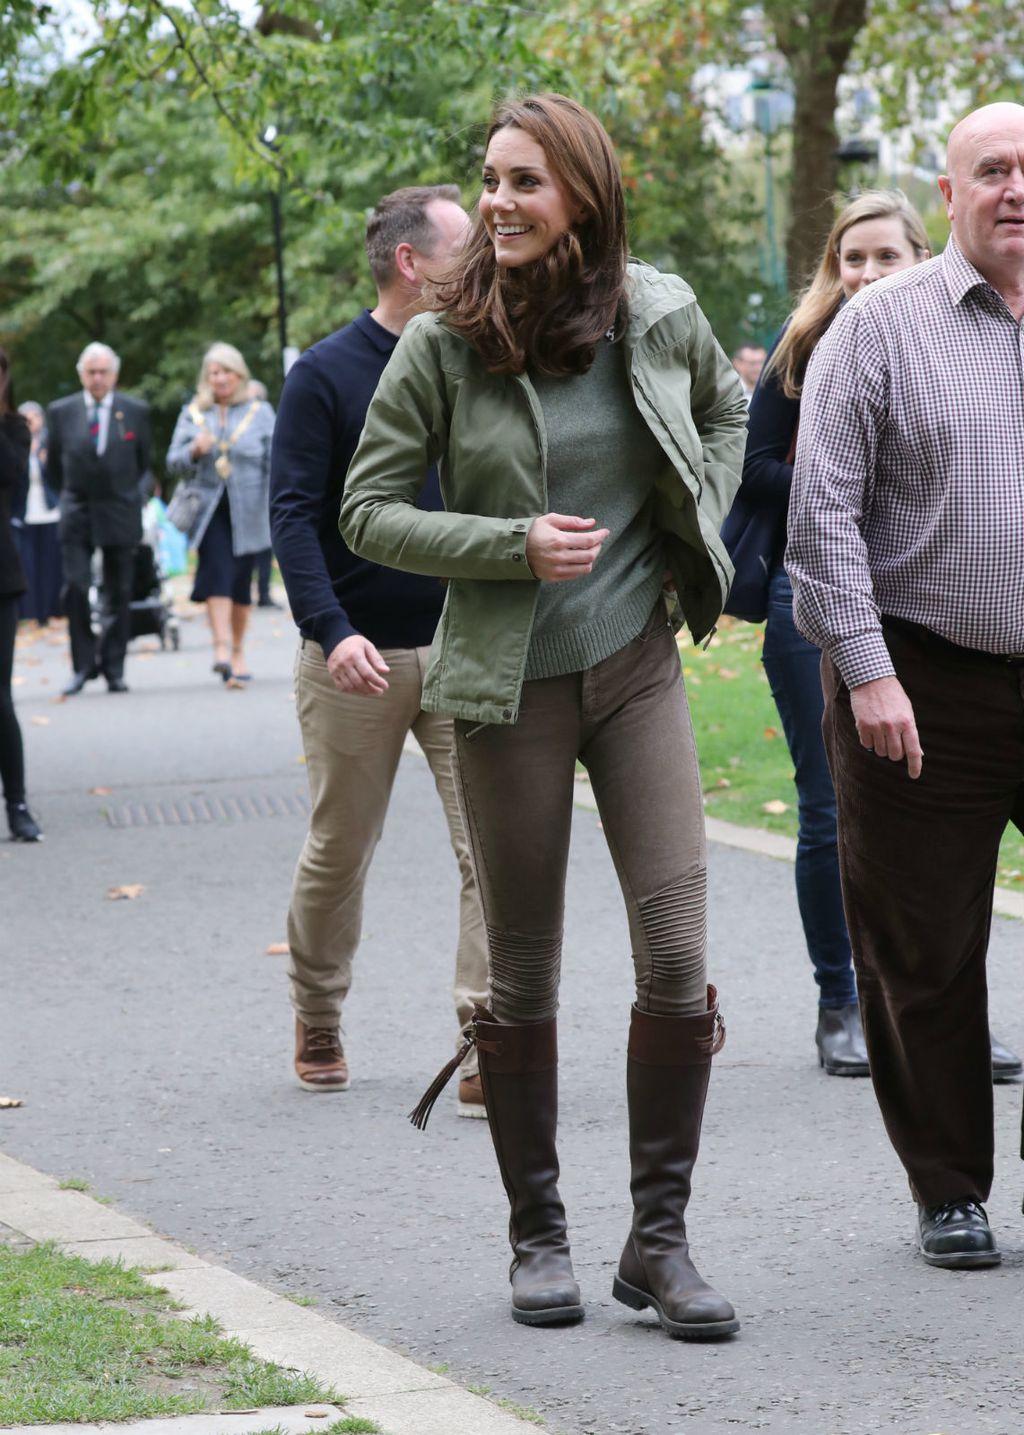 Catherine Middleton na prvoj službenoj dužnosti nakon rođenja princa Louisa - 2